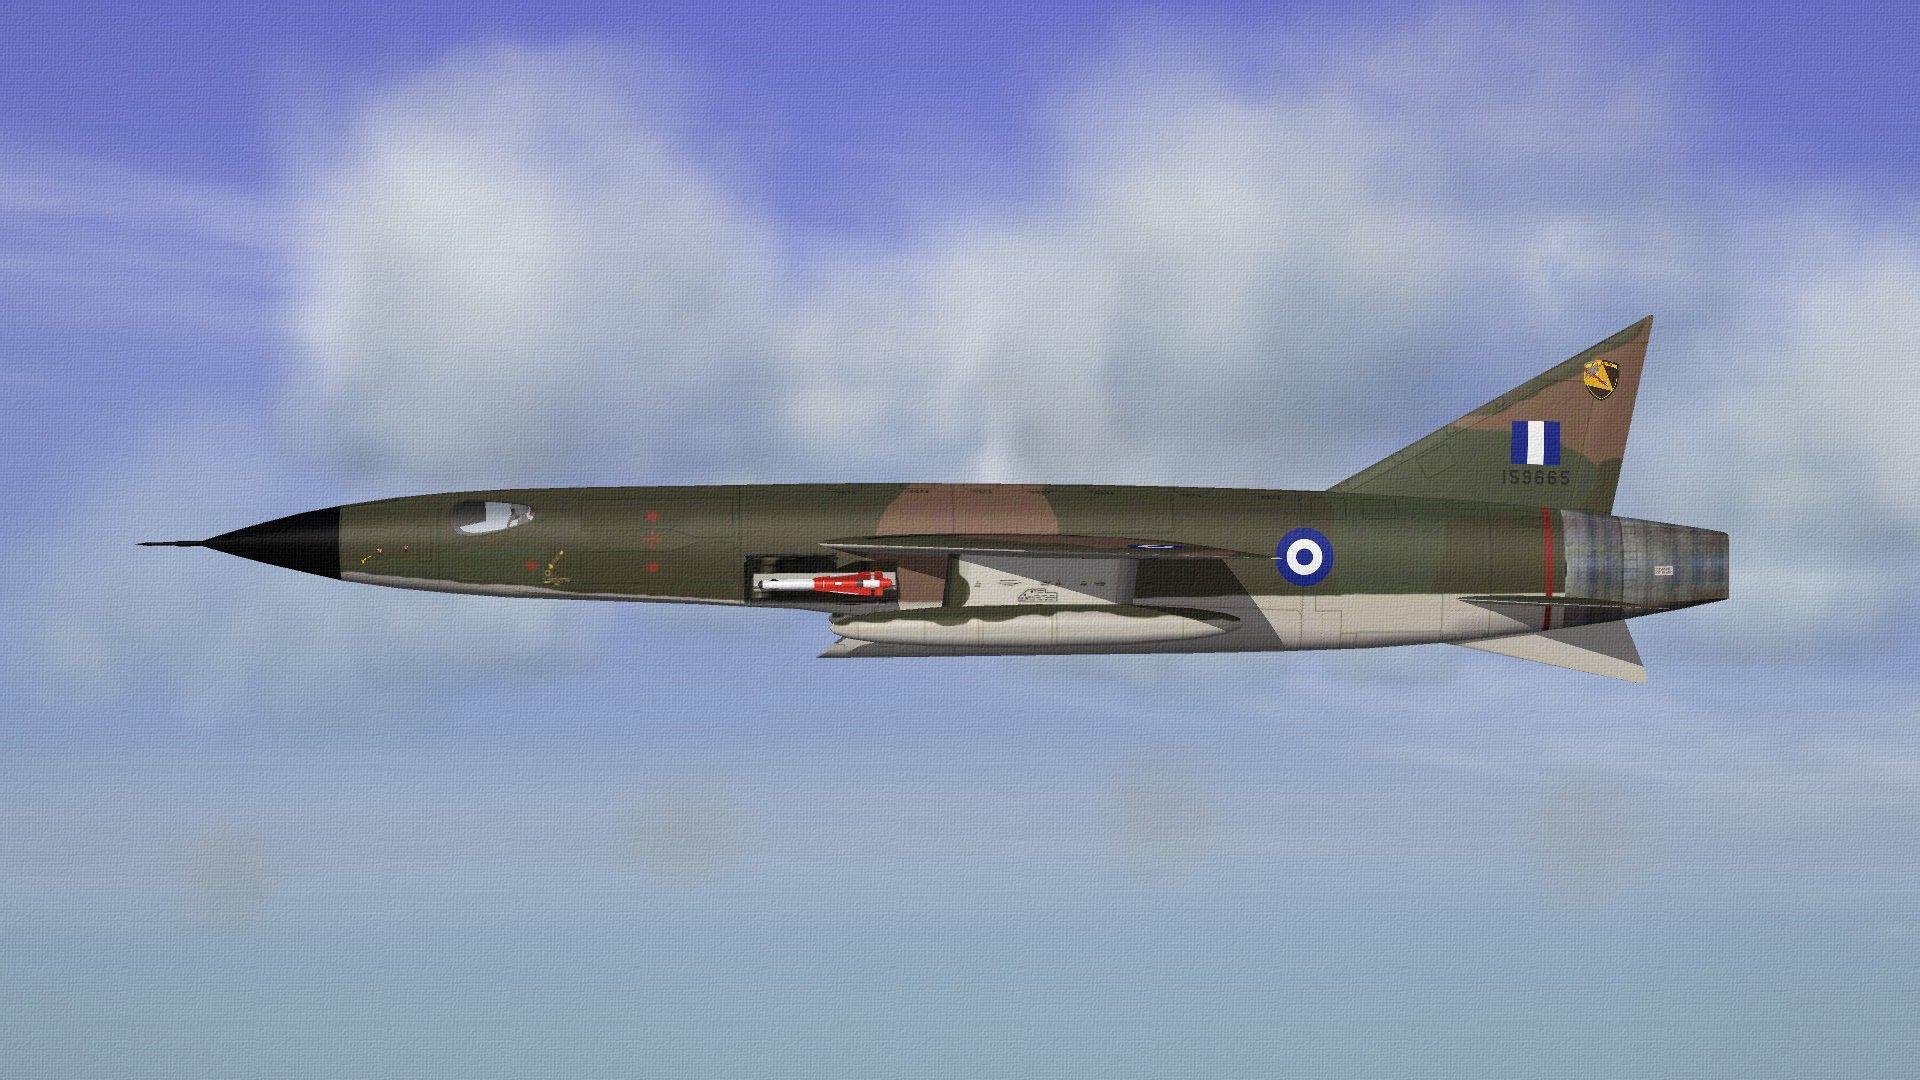 HAFF-103GTHUNDERWARRIOR05.jpg